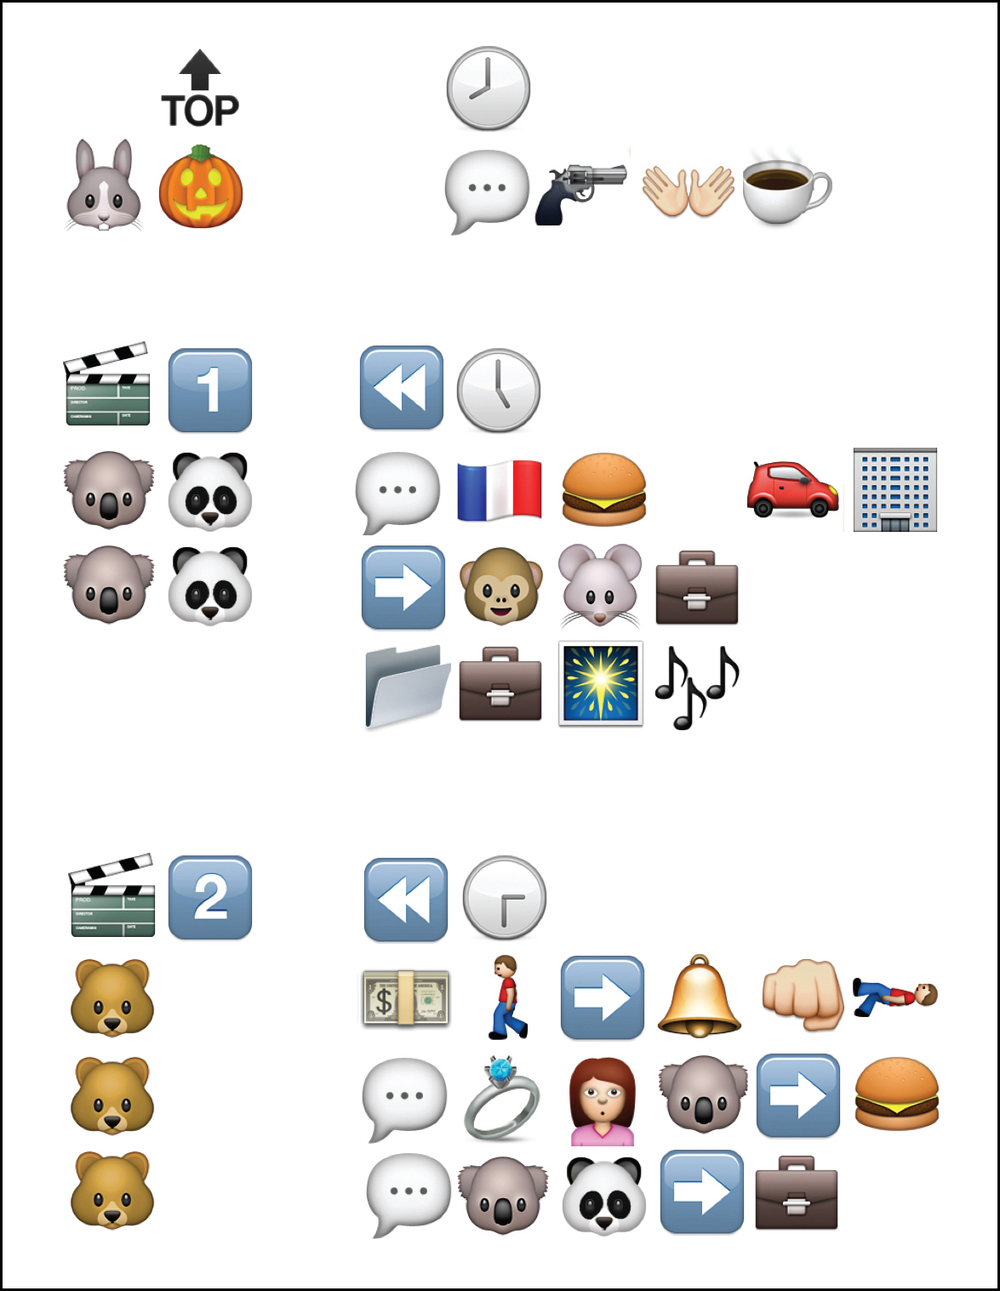 ART2373 Symbol Design - Emoji Narrative Detail 2: Joshua Johns